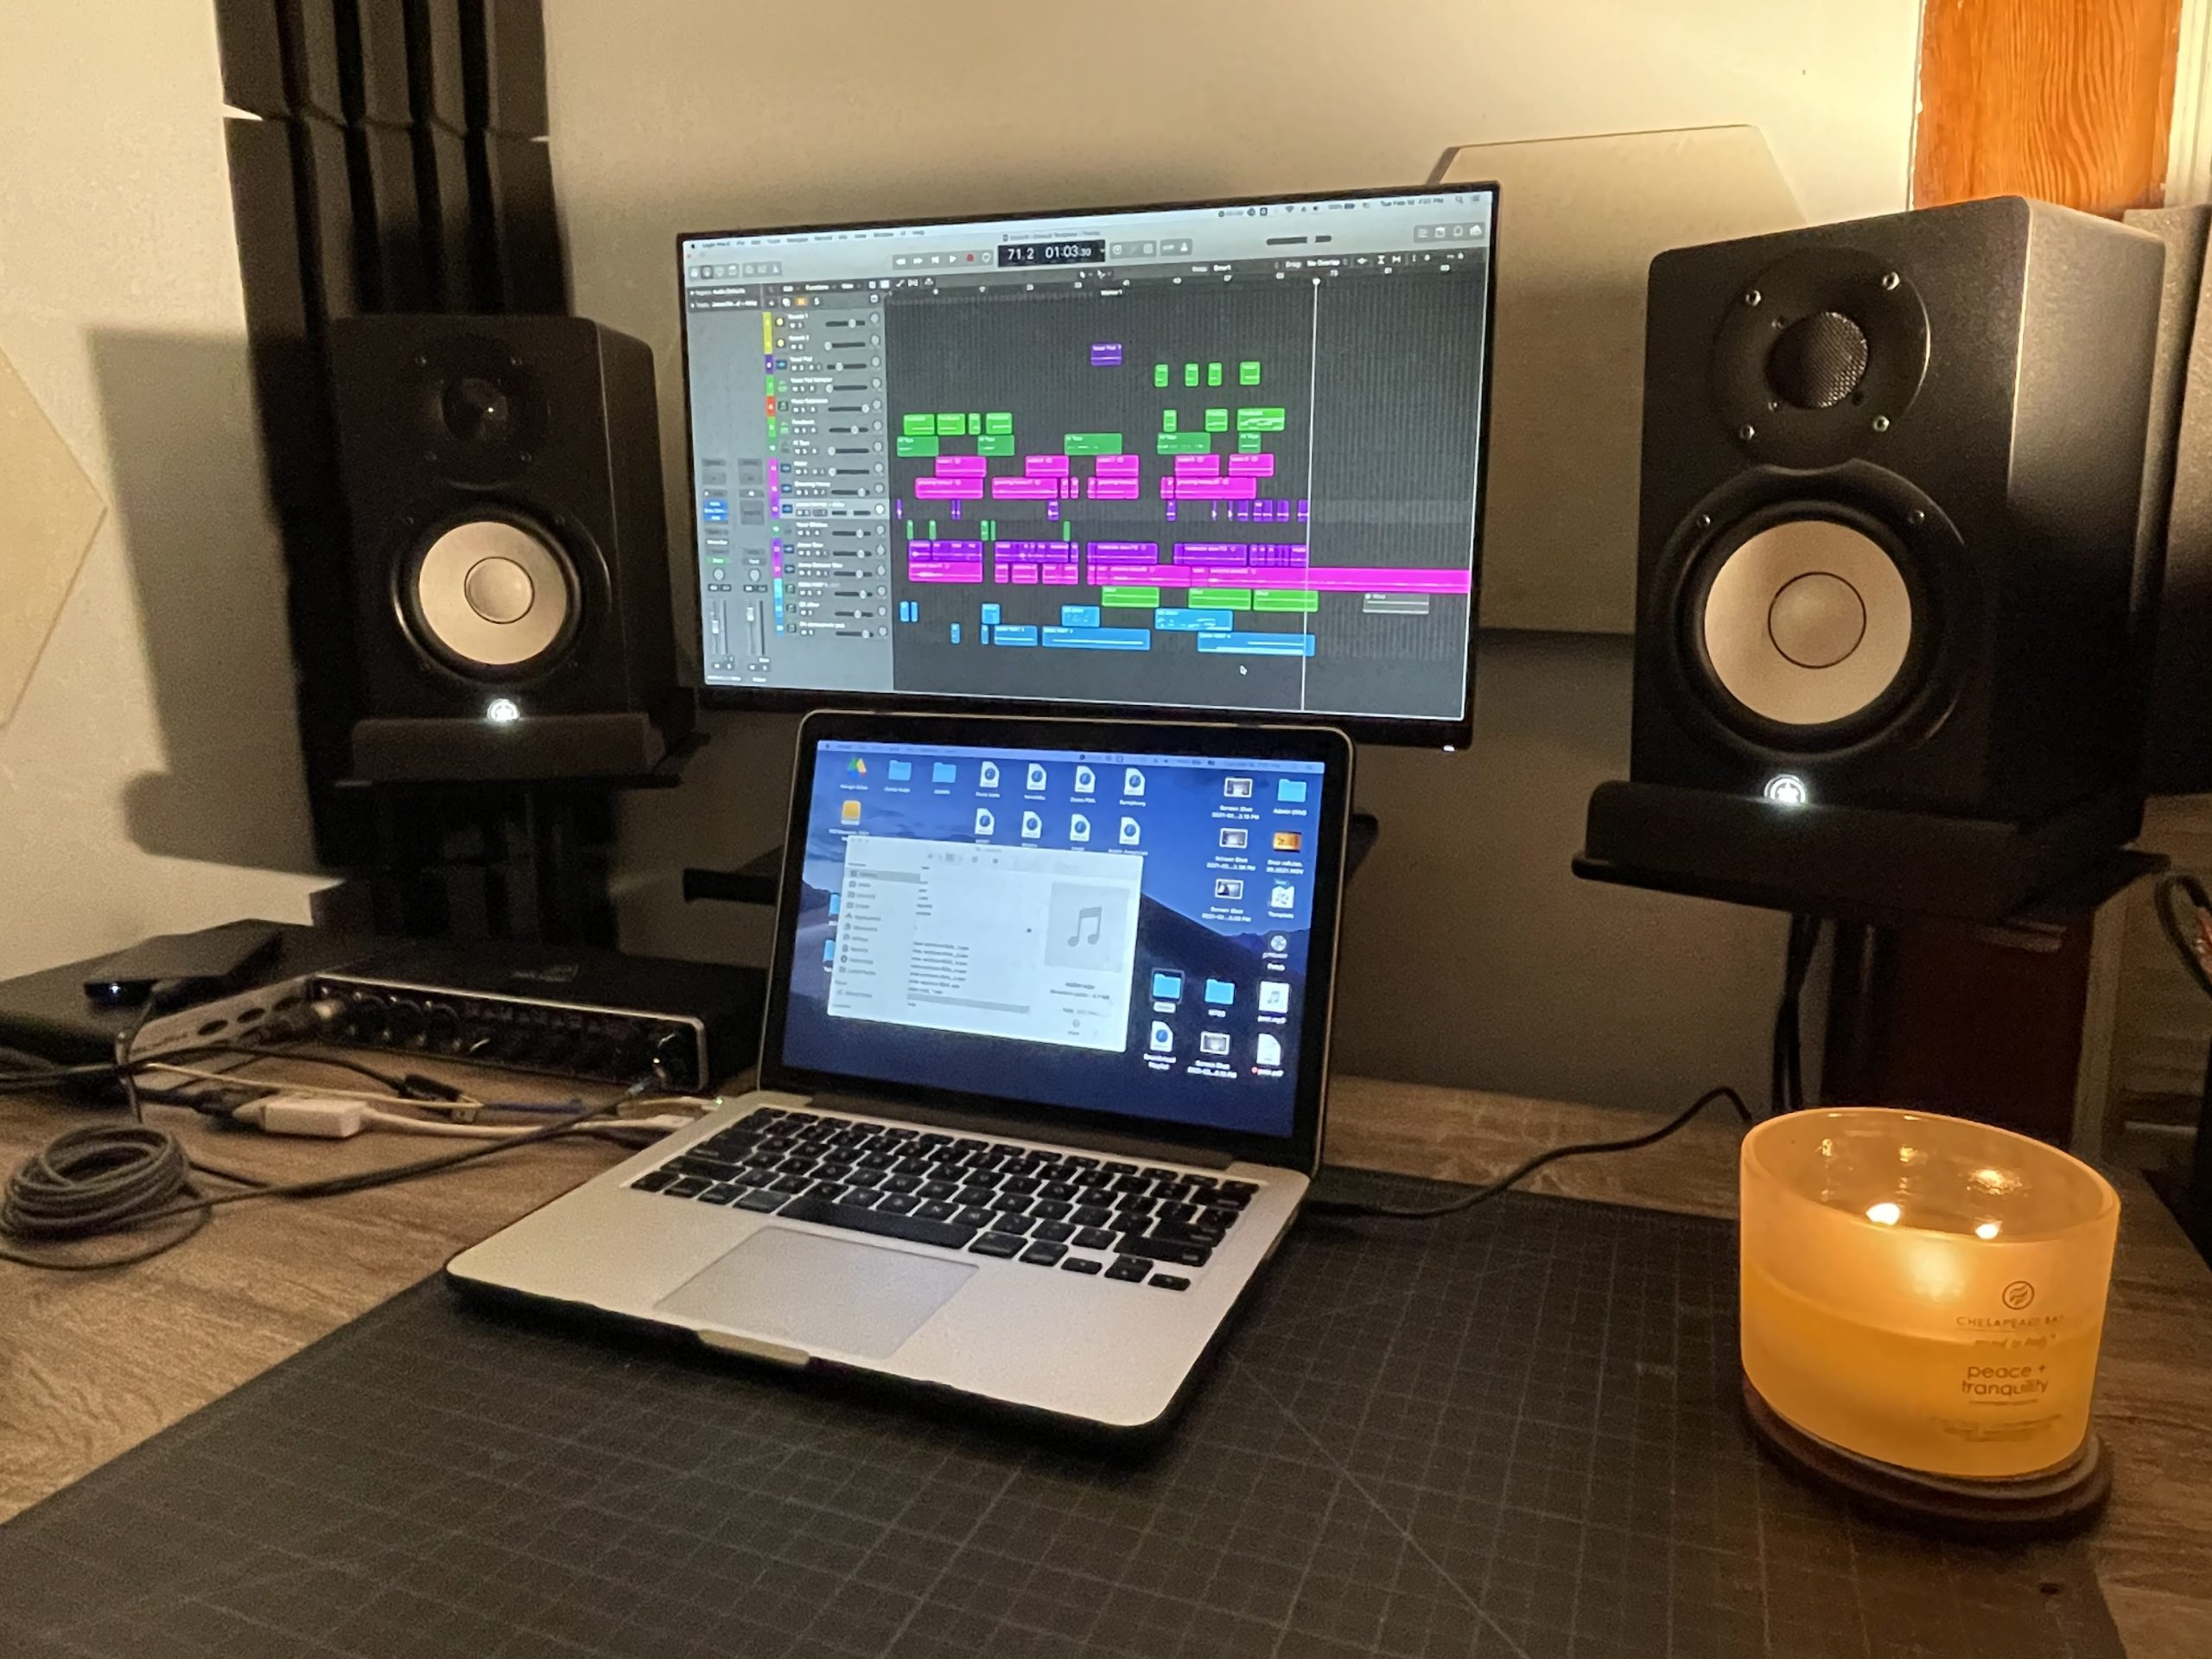 Work desk with speakers